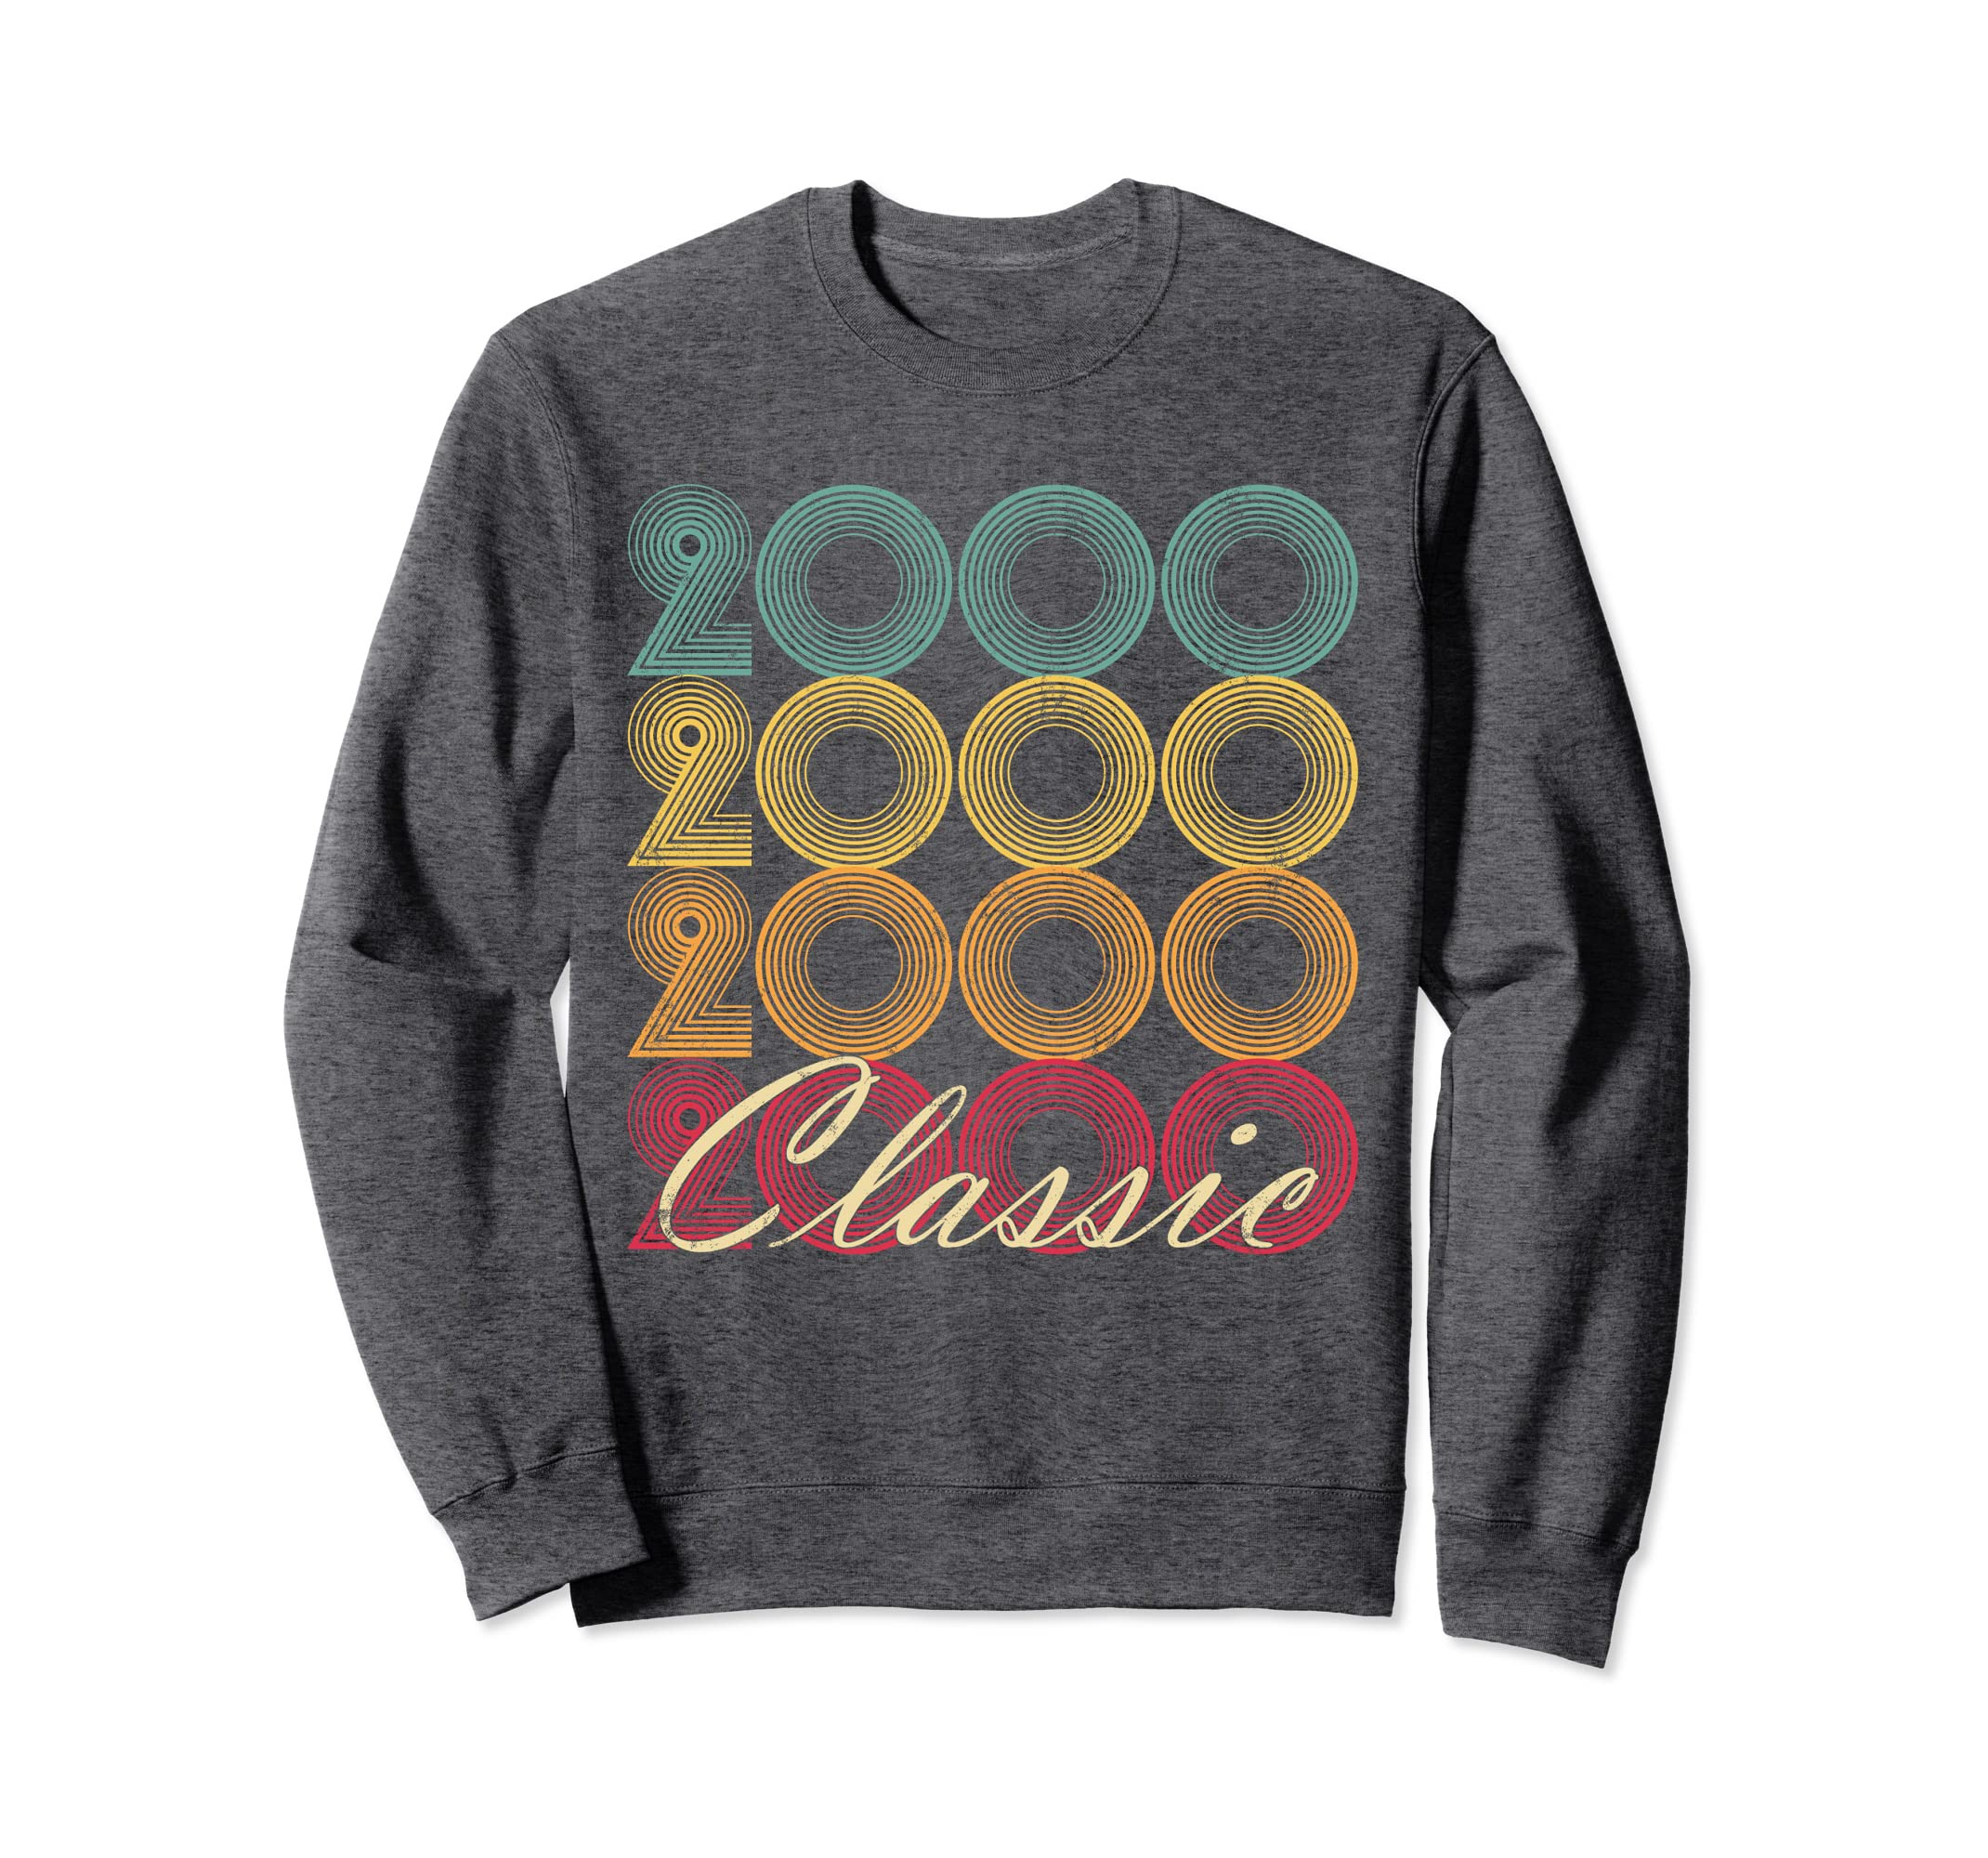 Classic 2000 18th Birthday Vintage Sweatshirt Retro 18 Gift-Protee